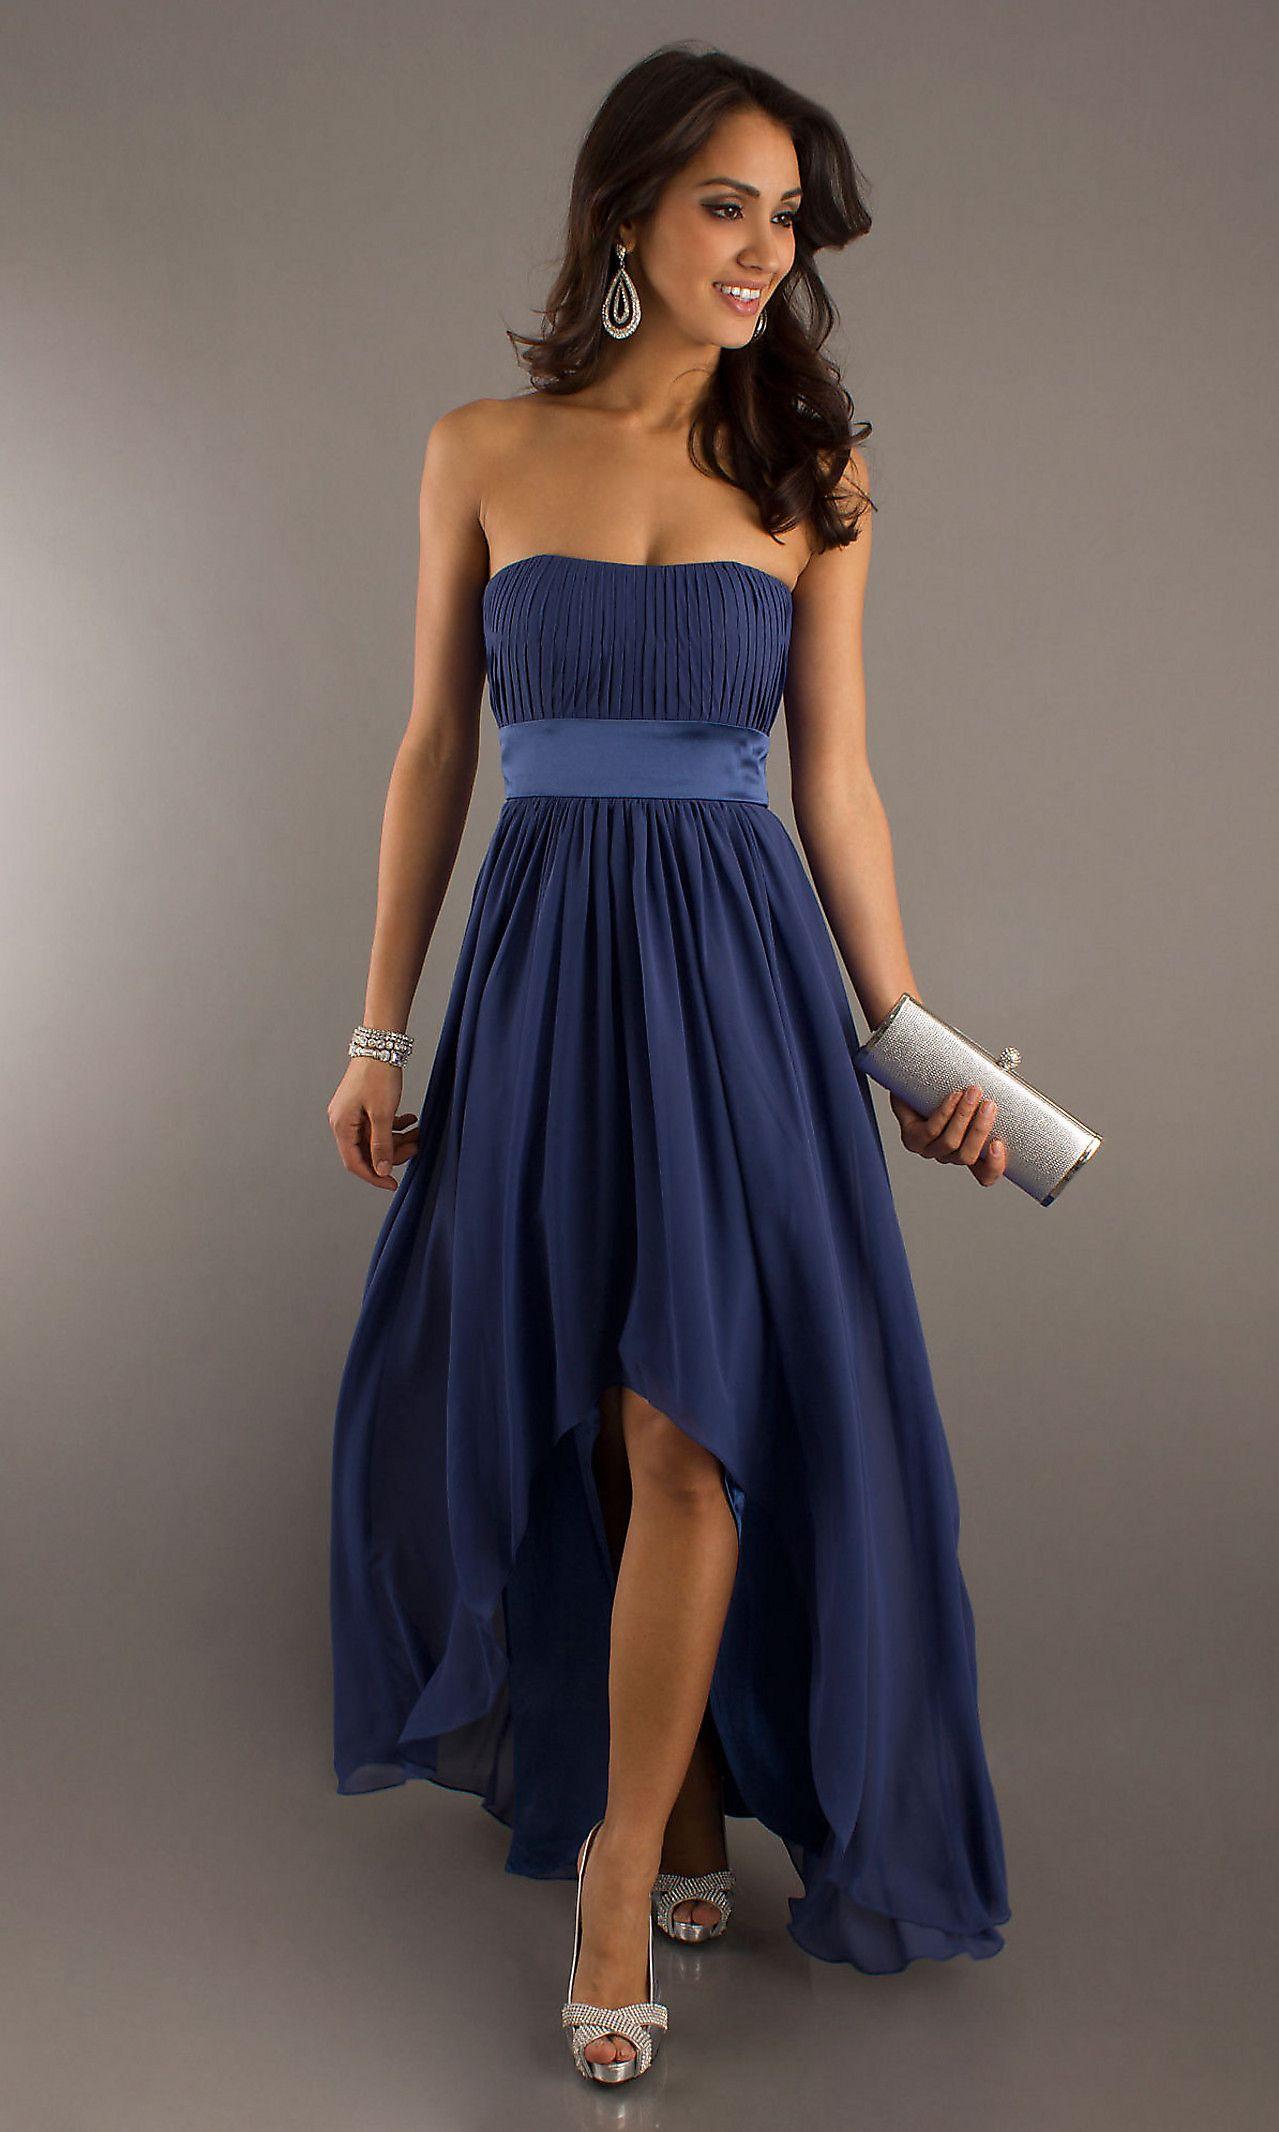 Strapless hi low prom dresses bridesmaid dress simply dresses strapless hi low prom dresses bridesmaid dress simply dresses ombrellifo Gallery